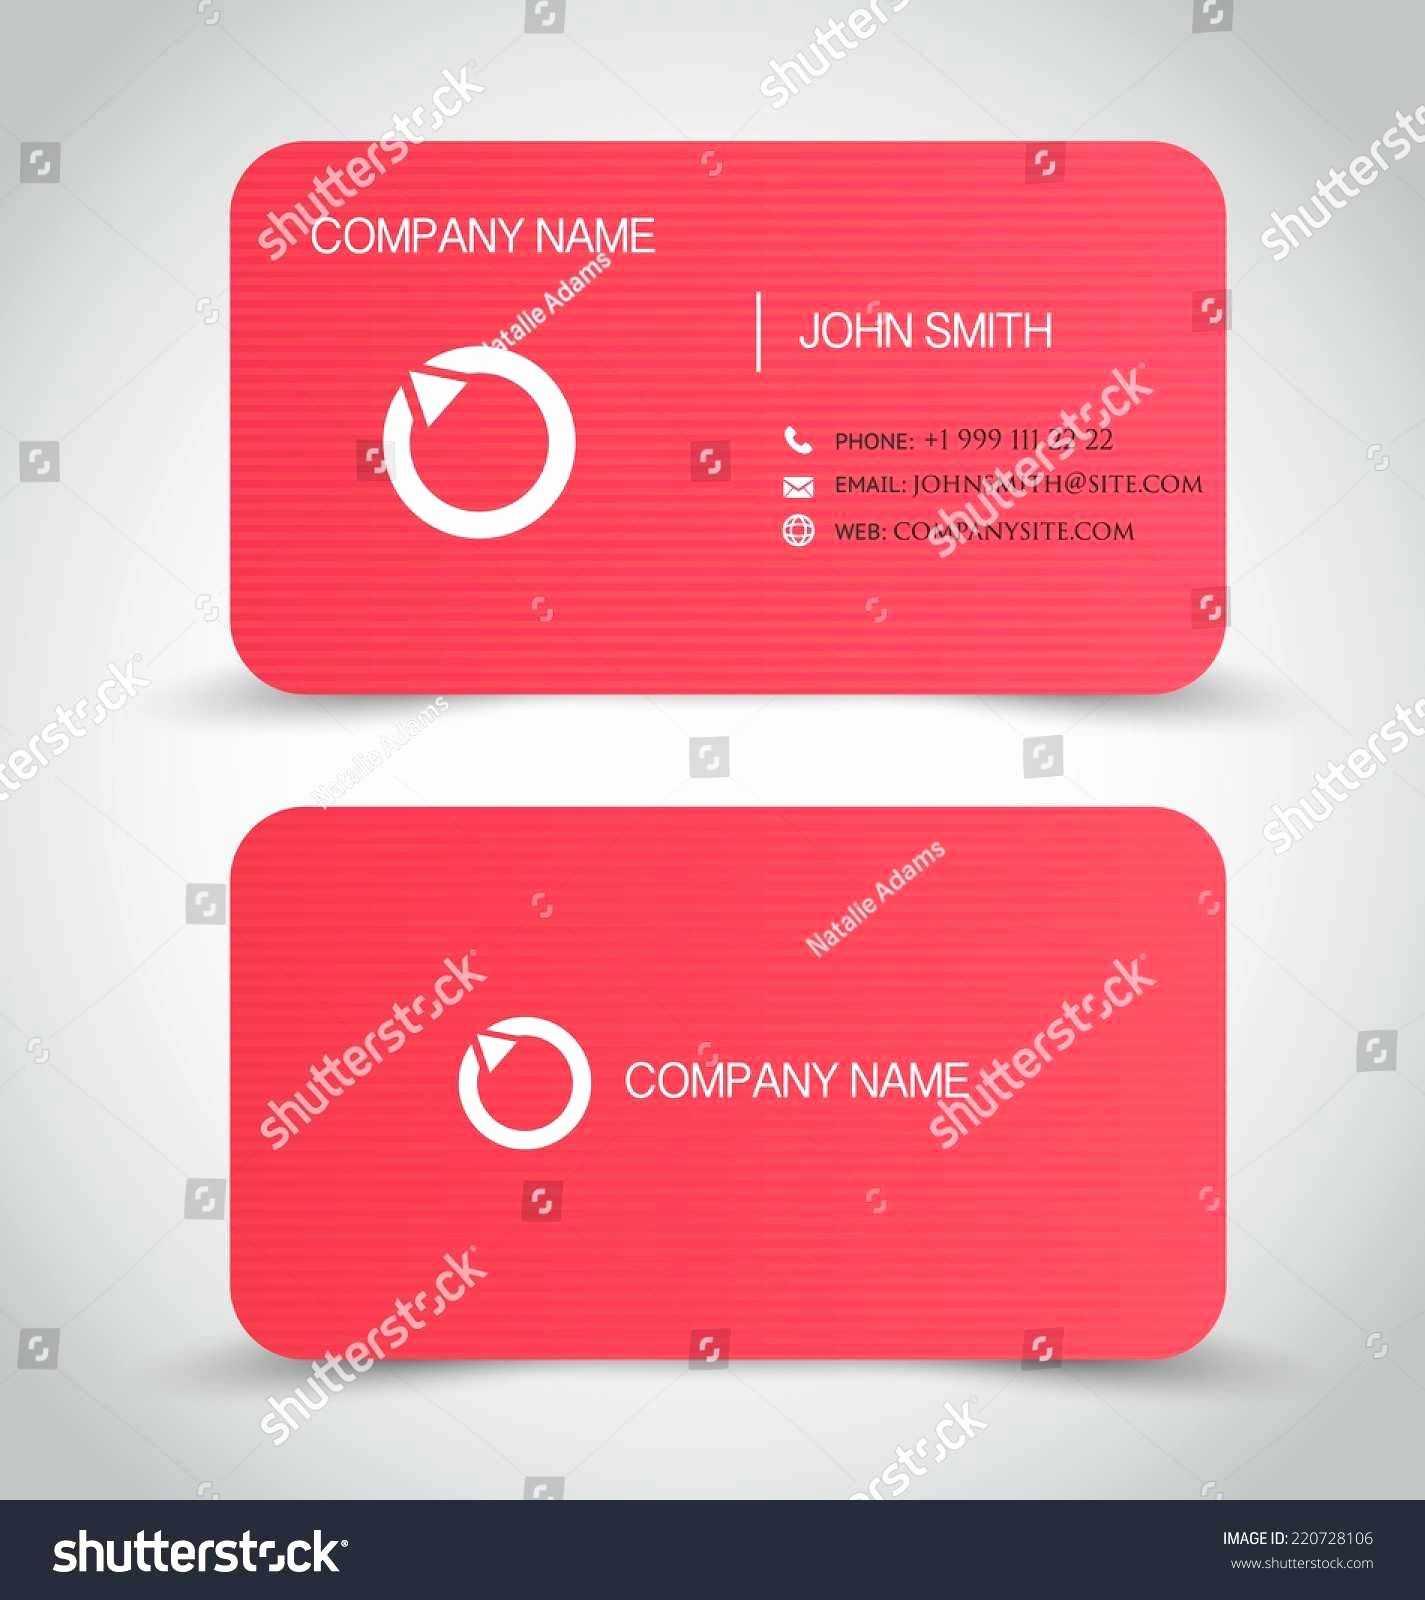 Acord 35 Elegant Corporate Bond Certificate Template Luxury With Regard To Corporate Bond Certificate Template